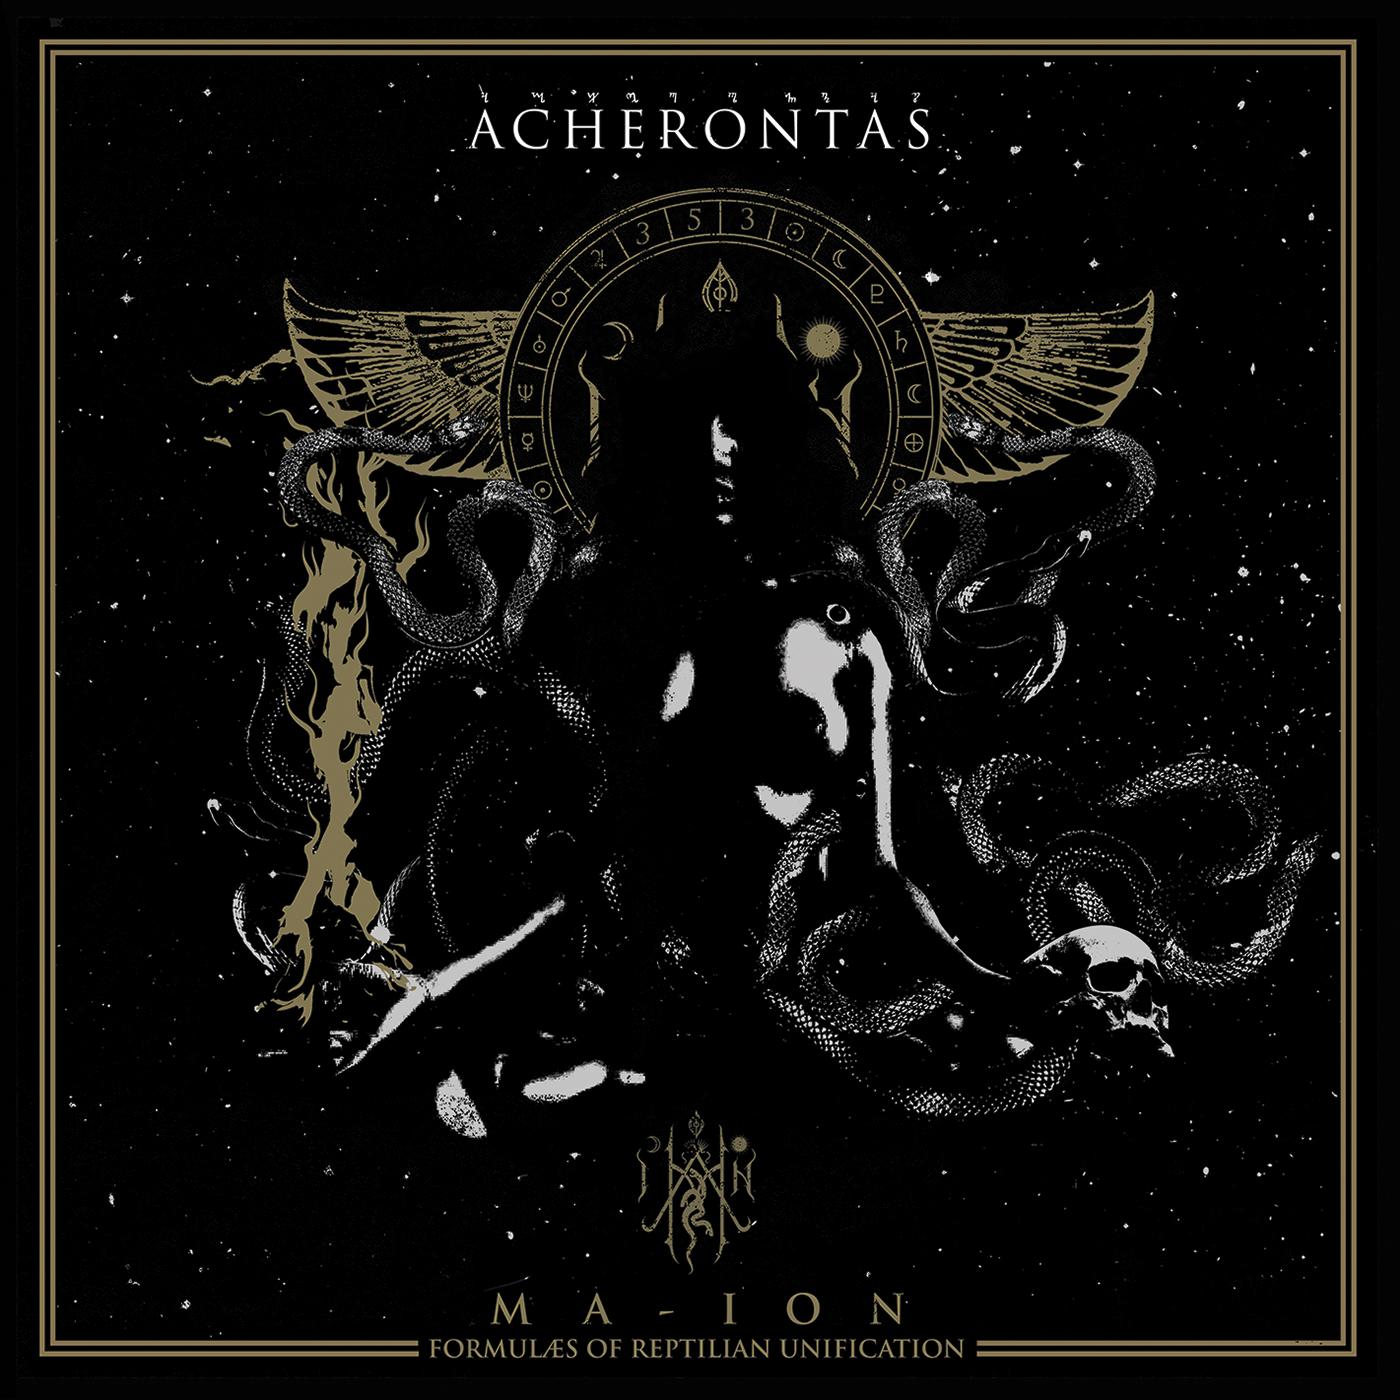 Acherontas-Ma-IoN